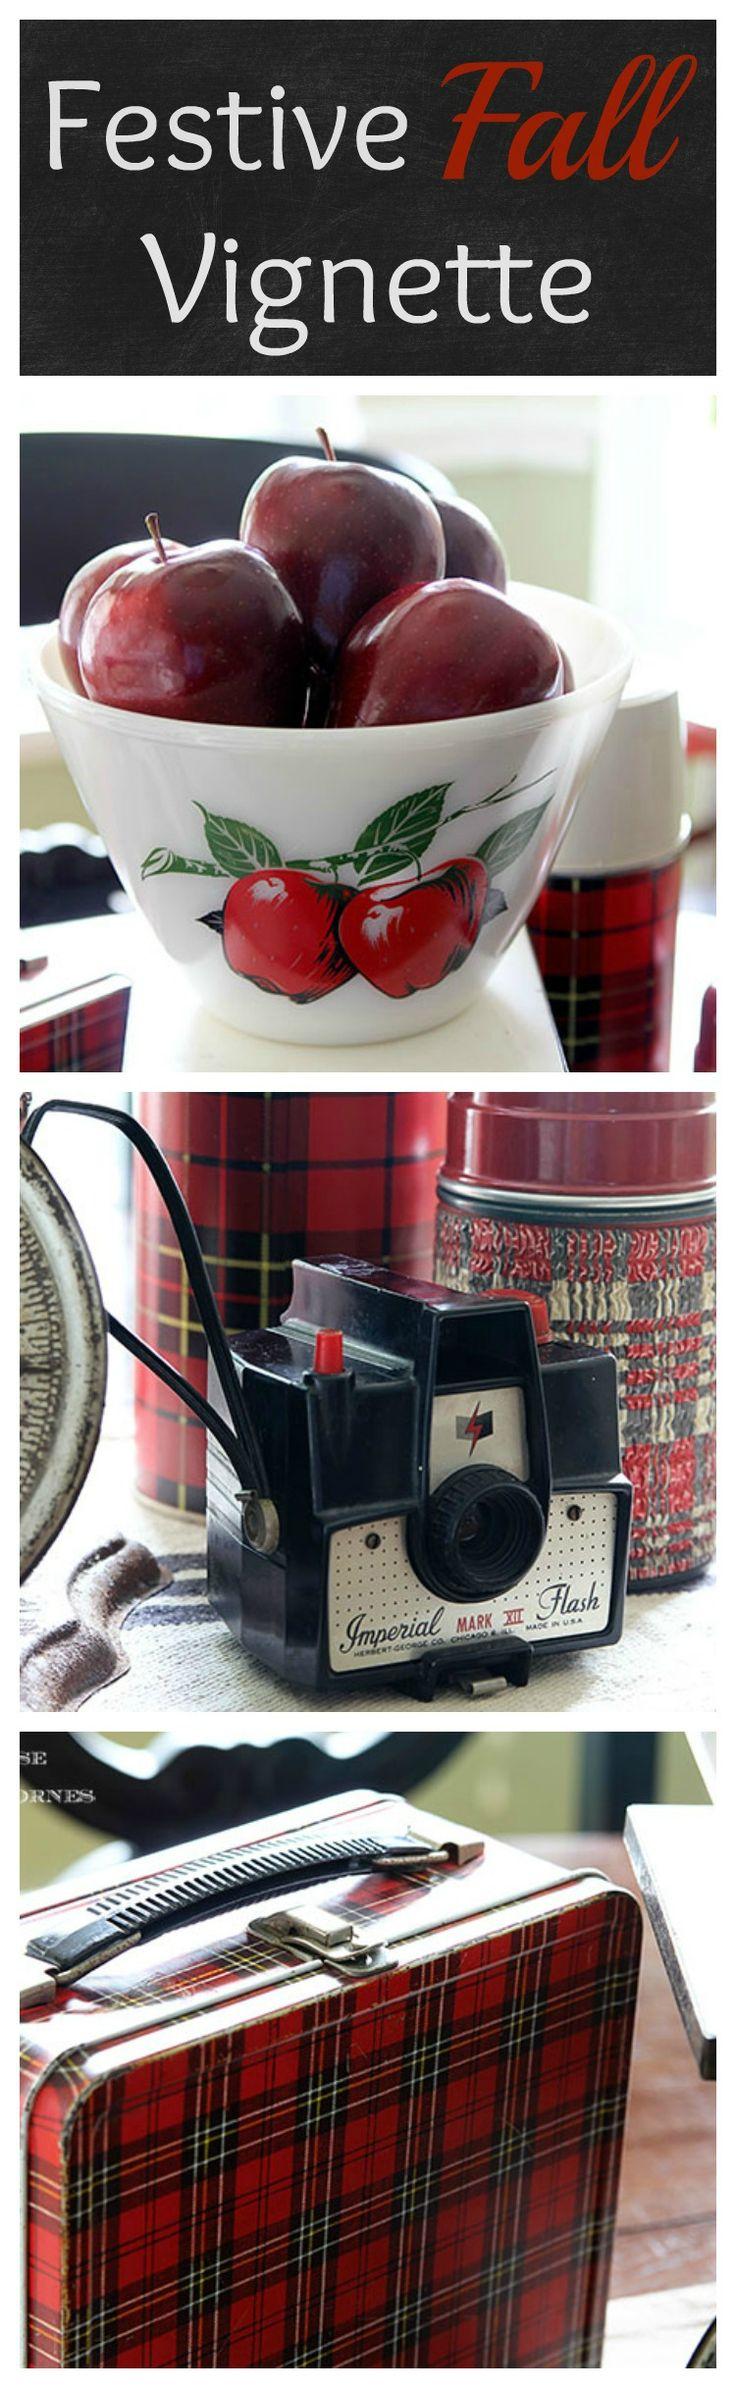 1000+ images about Vintage Kitchen on Pinterest